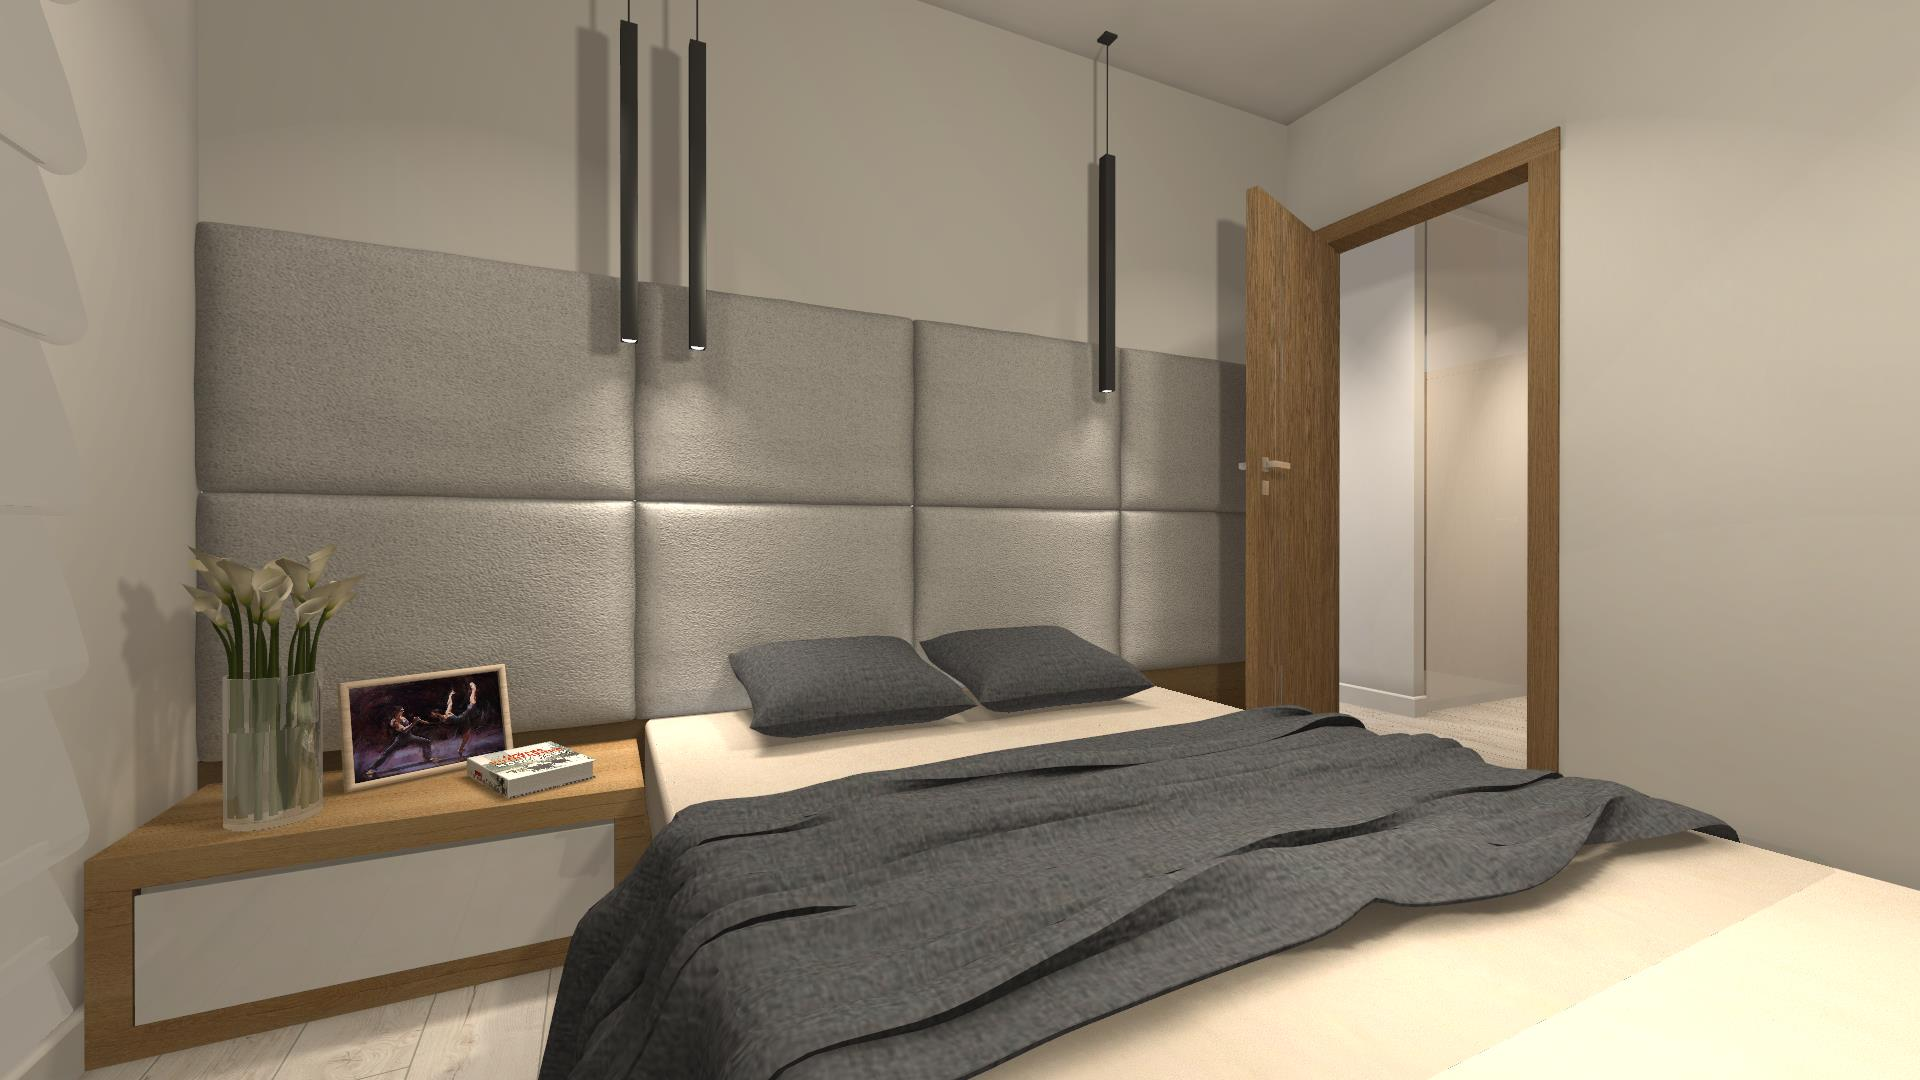 kuchnia i sypialnia_51